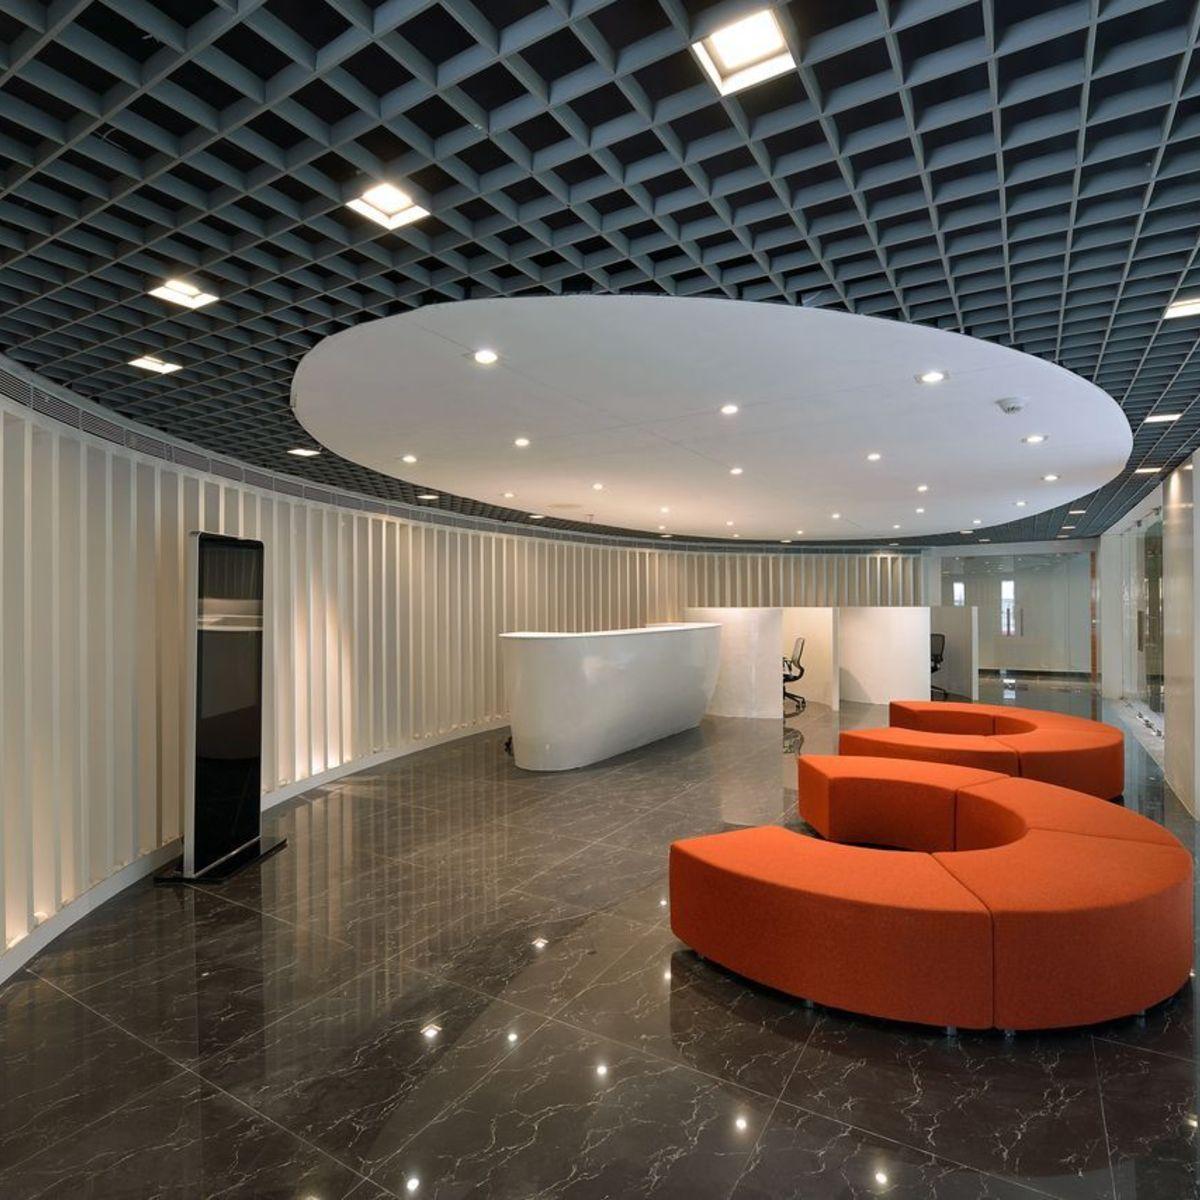 abin design studio and the newtown school in kolkata india